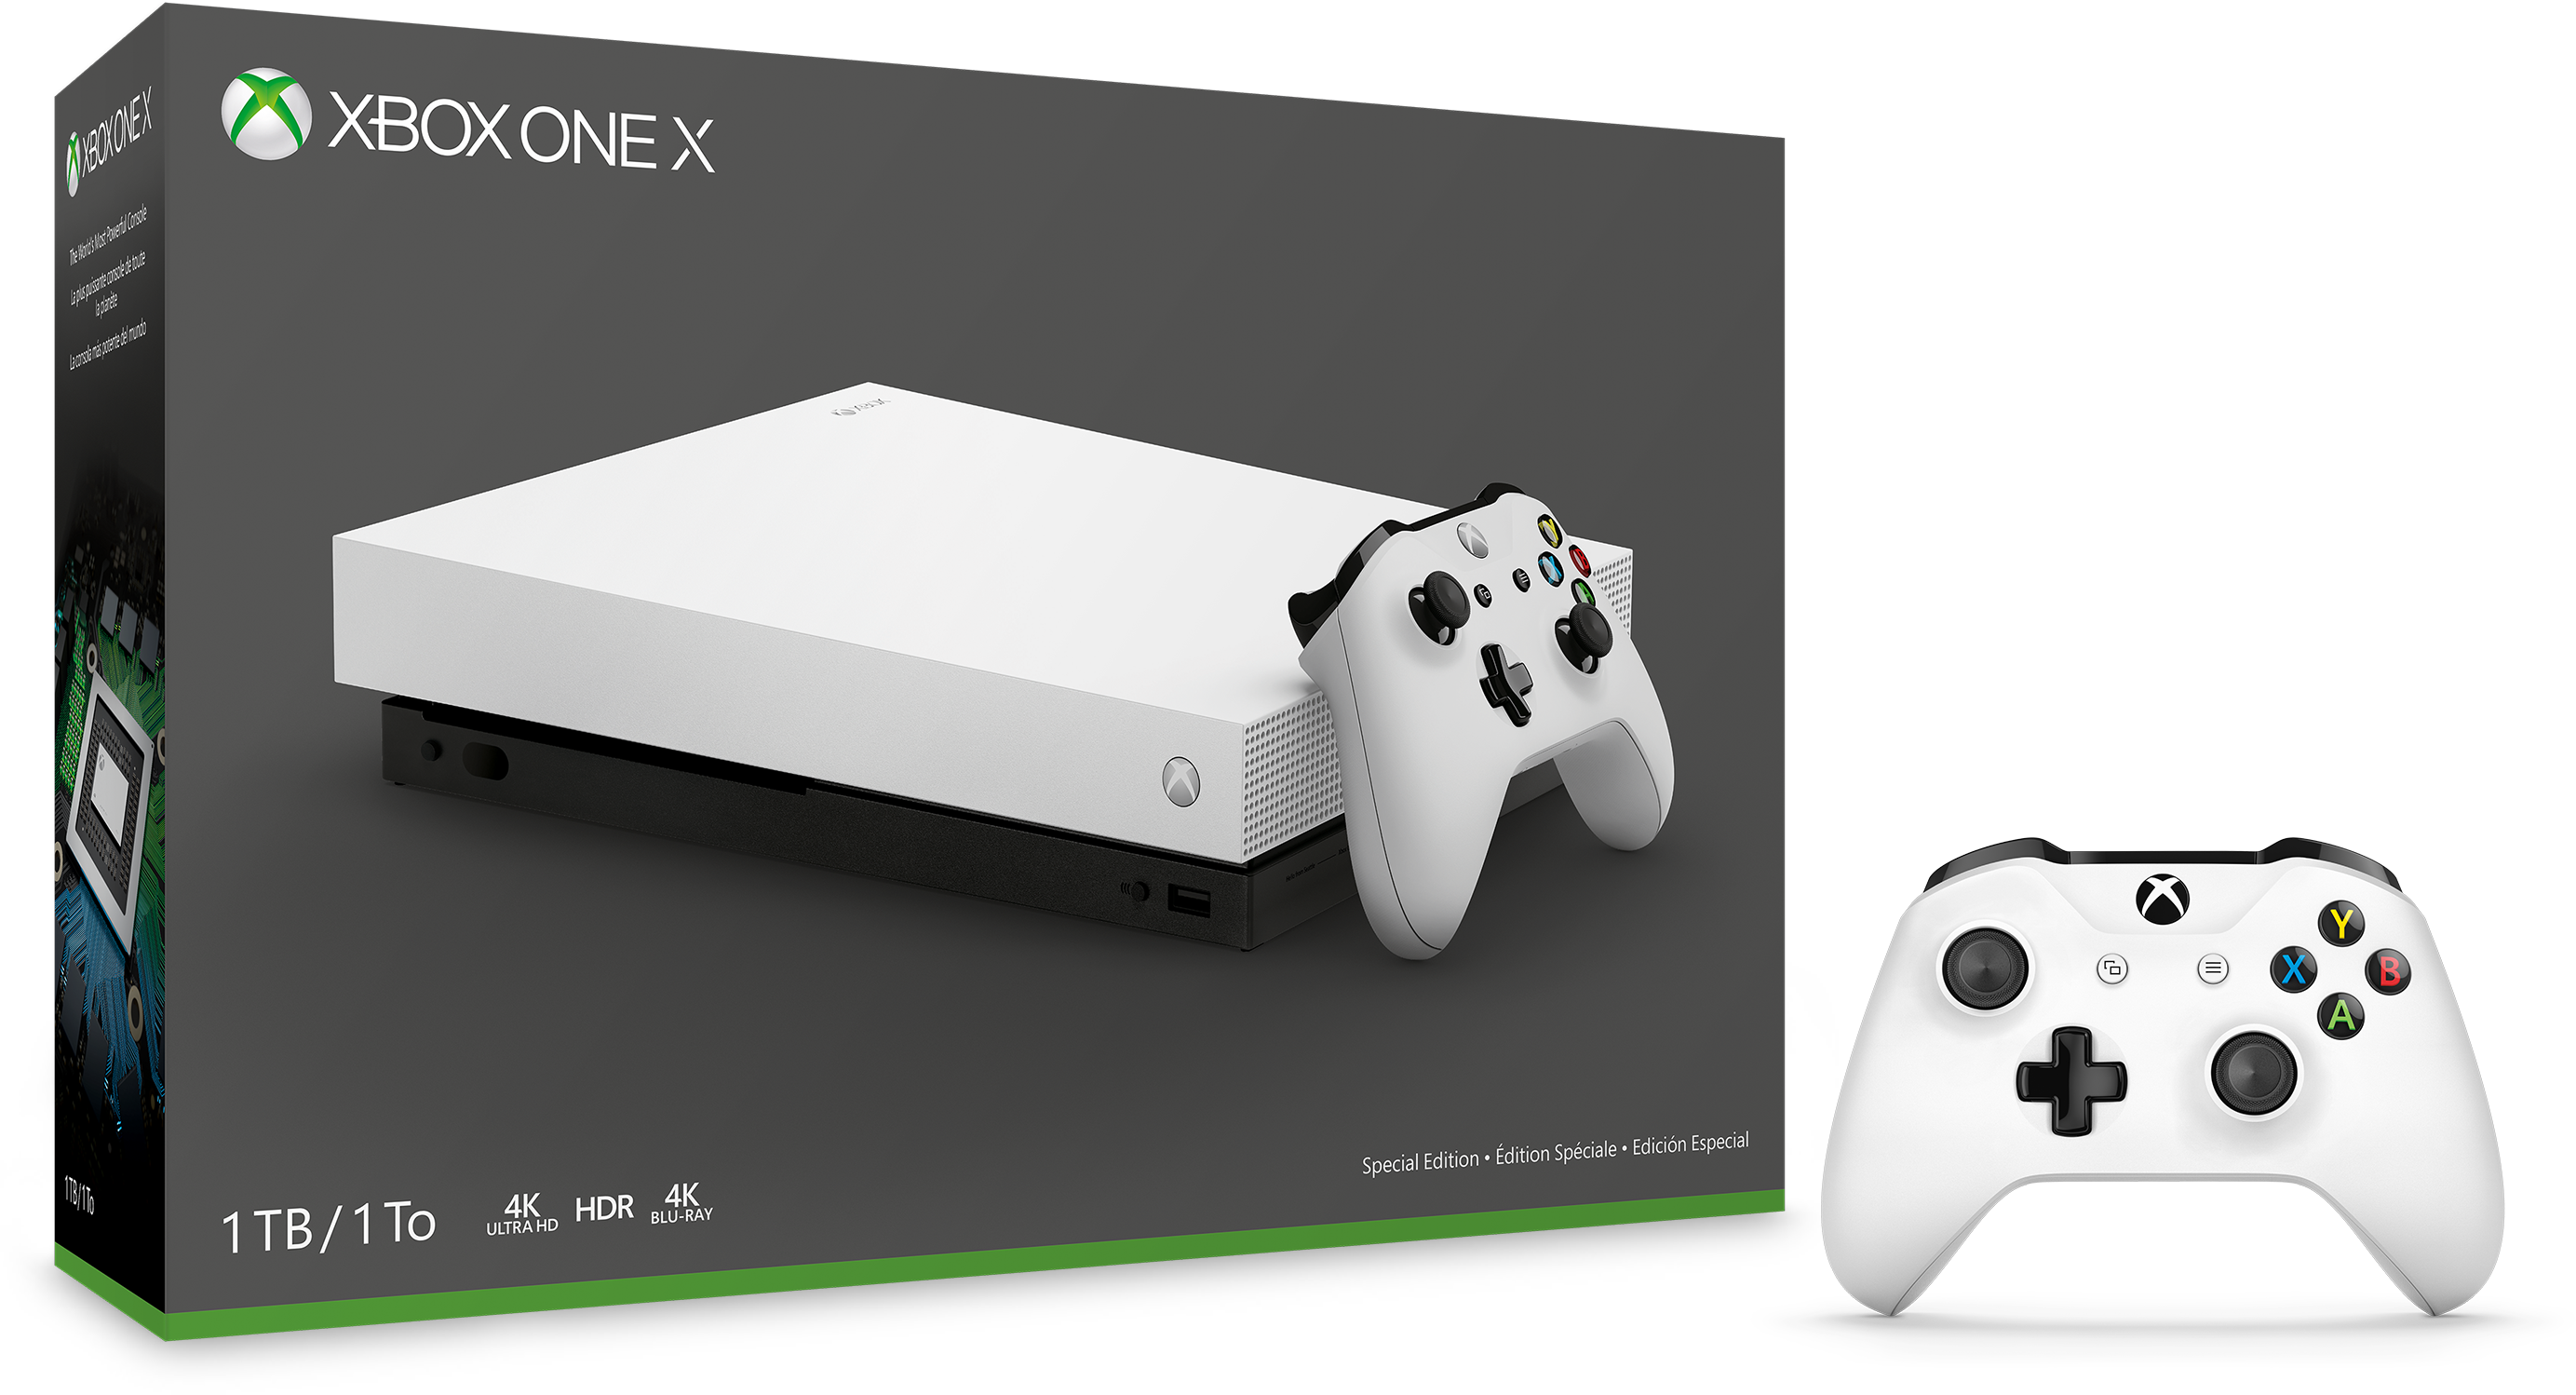 Xbox One X Robot White 1TB Console.